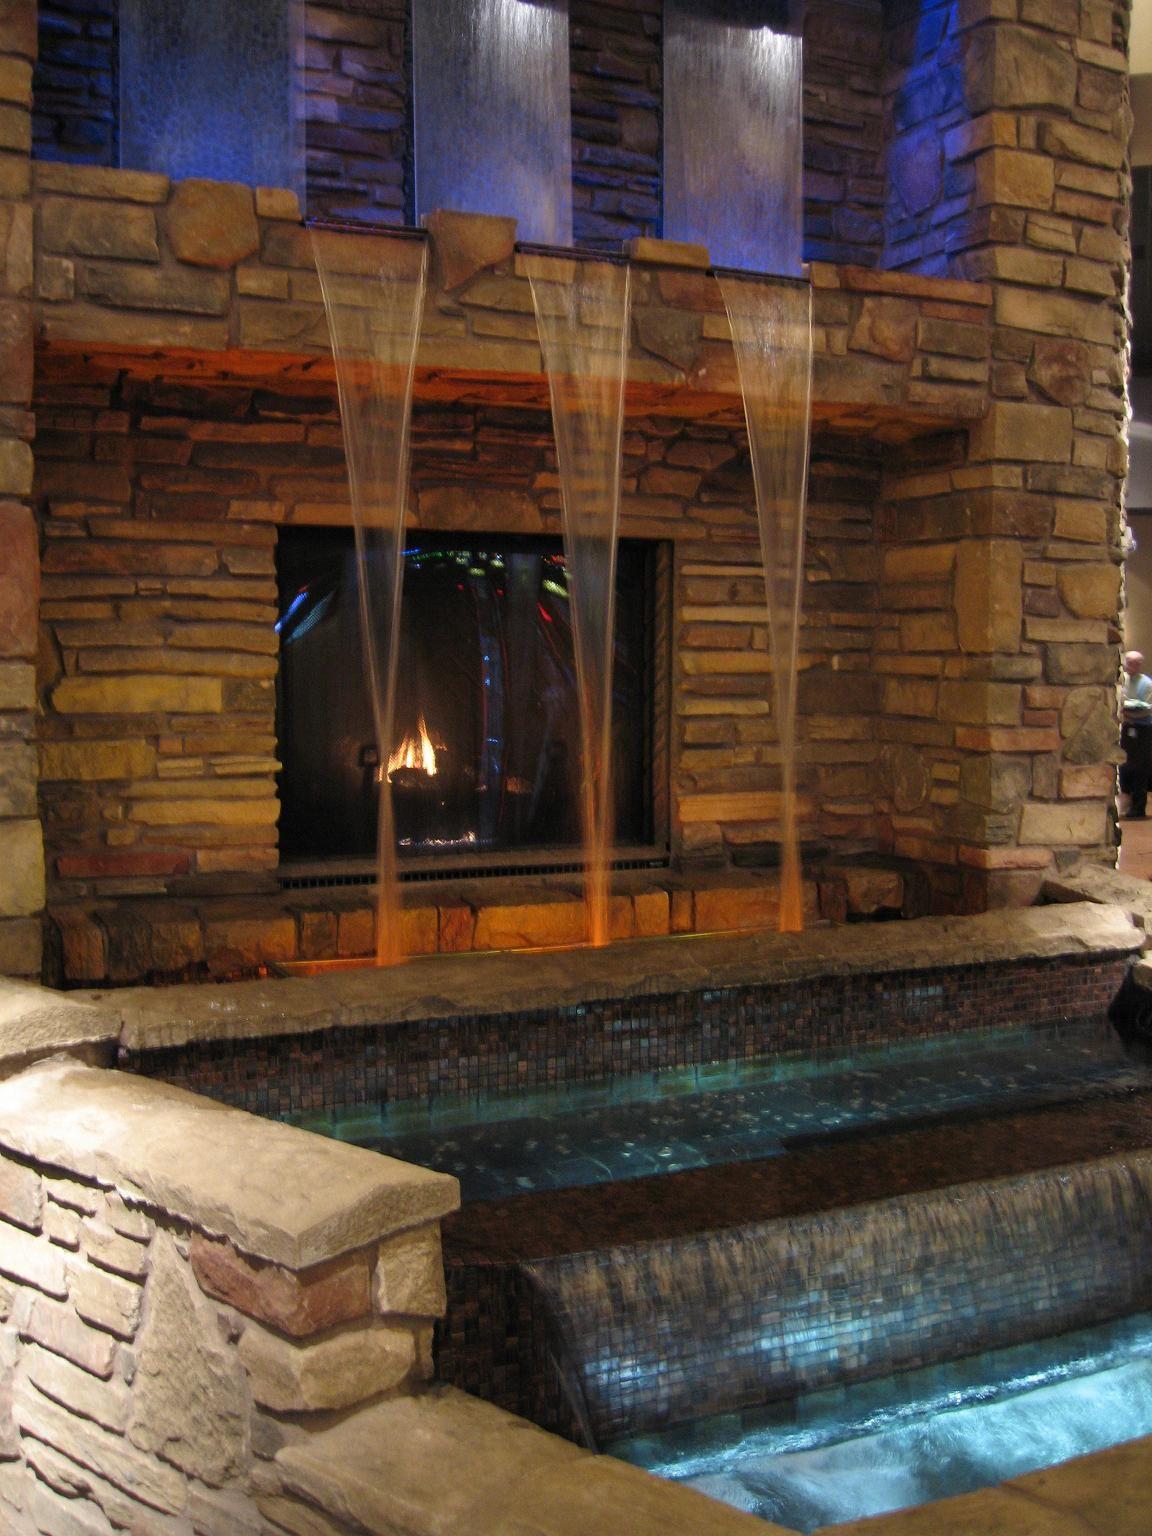 See Through Window Beneath Waterfall From Pool At Roof Of Rhe Basement Waterfall Wall Indoor Waterfall Water Walls